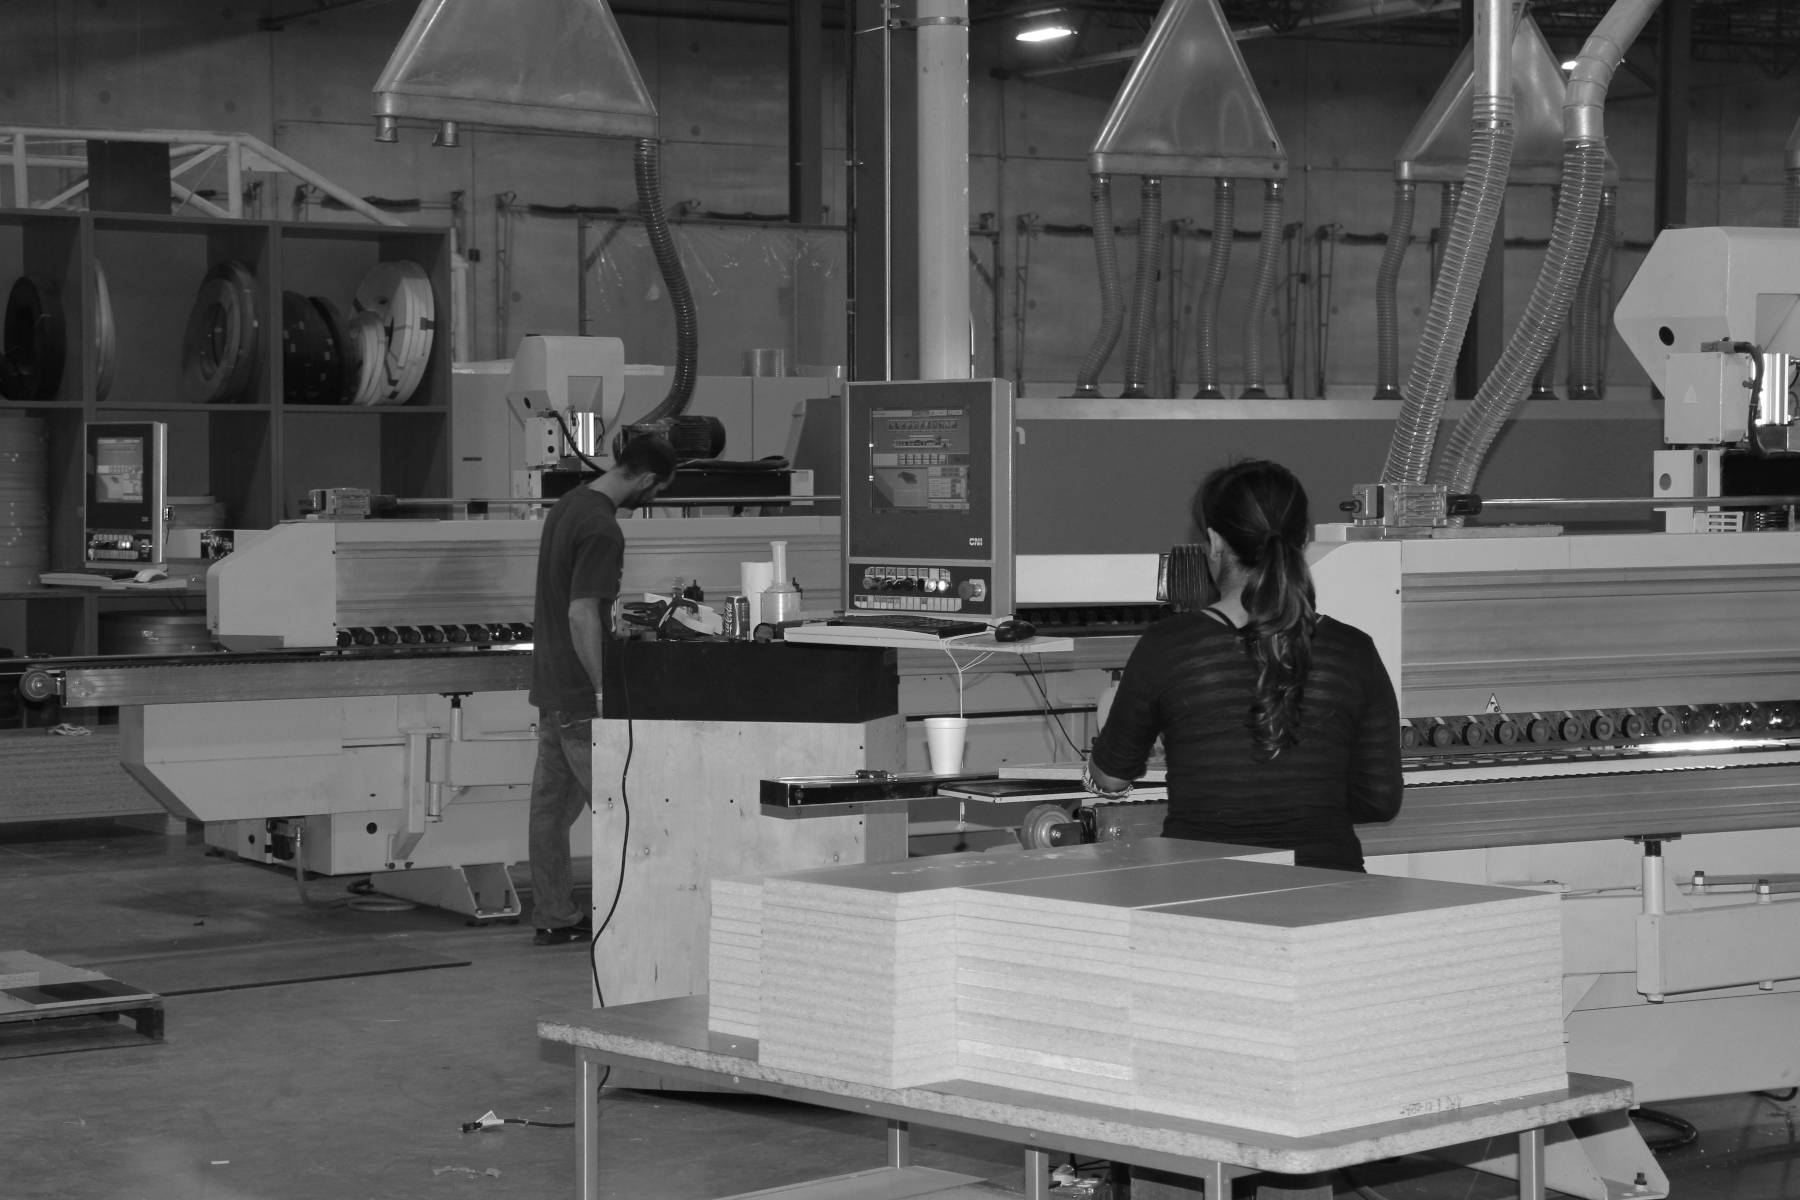 https://mw-sf.com/wp-content/uploads/2019/11/wood-manufacturing-02.jpg